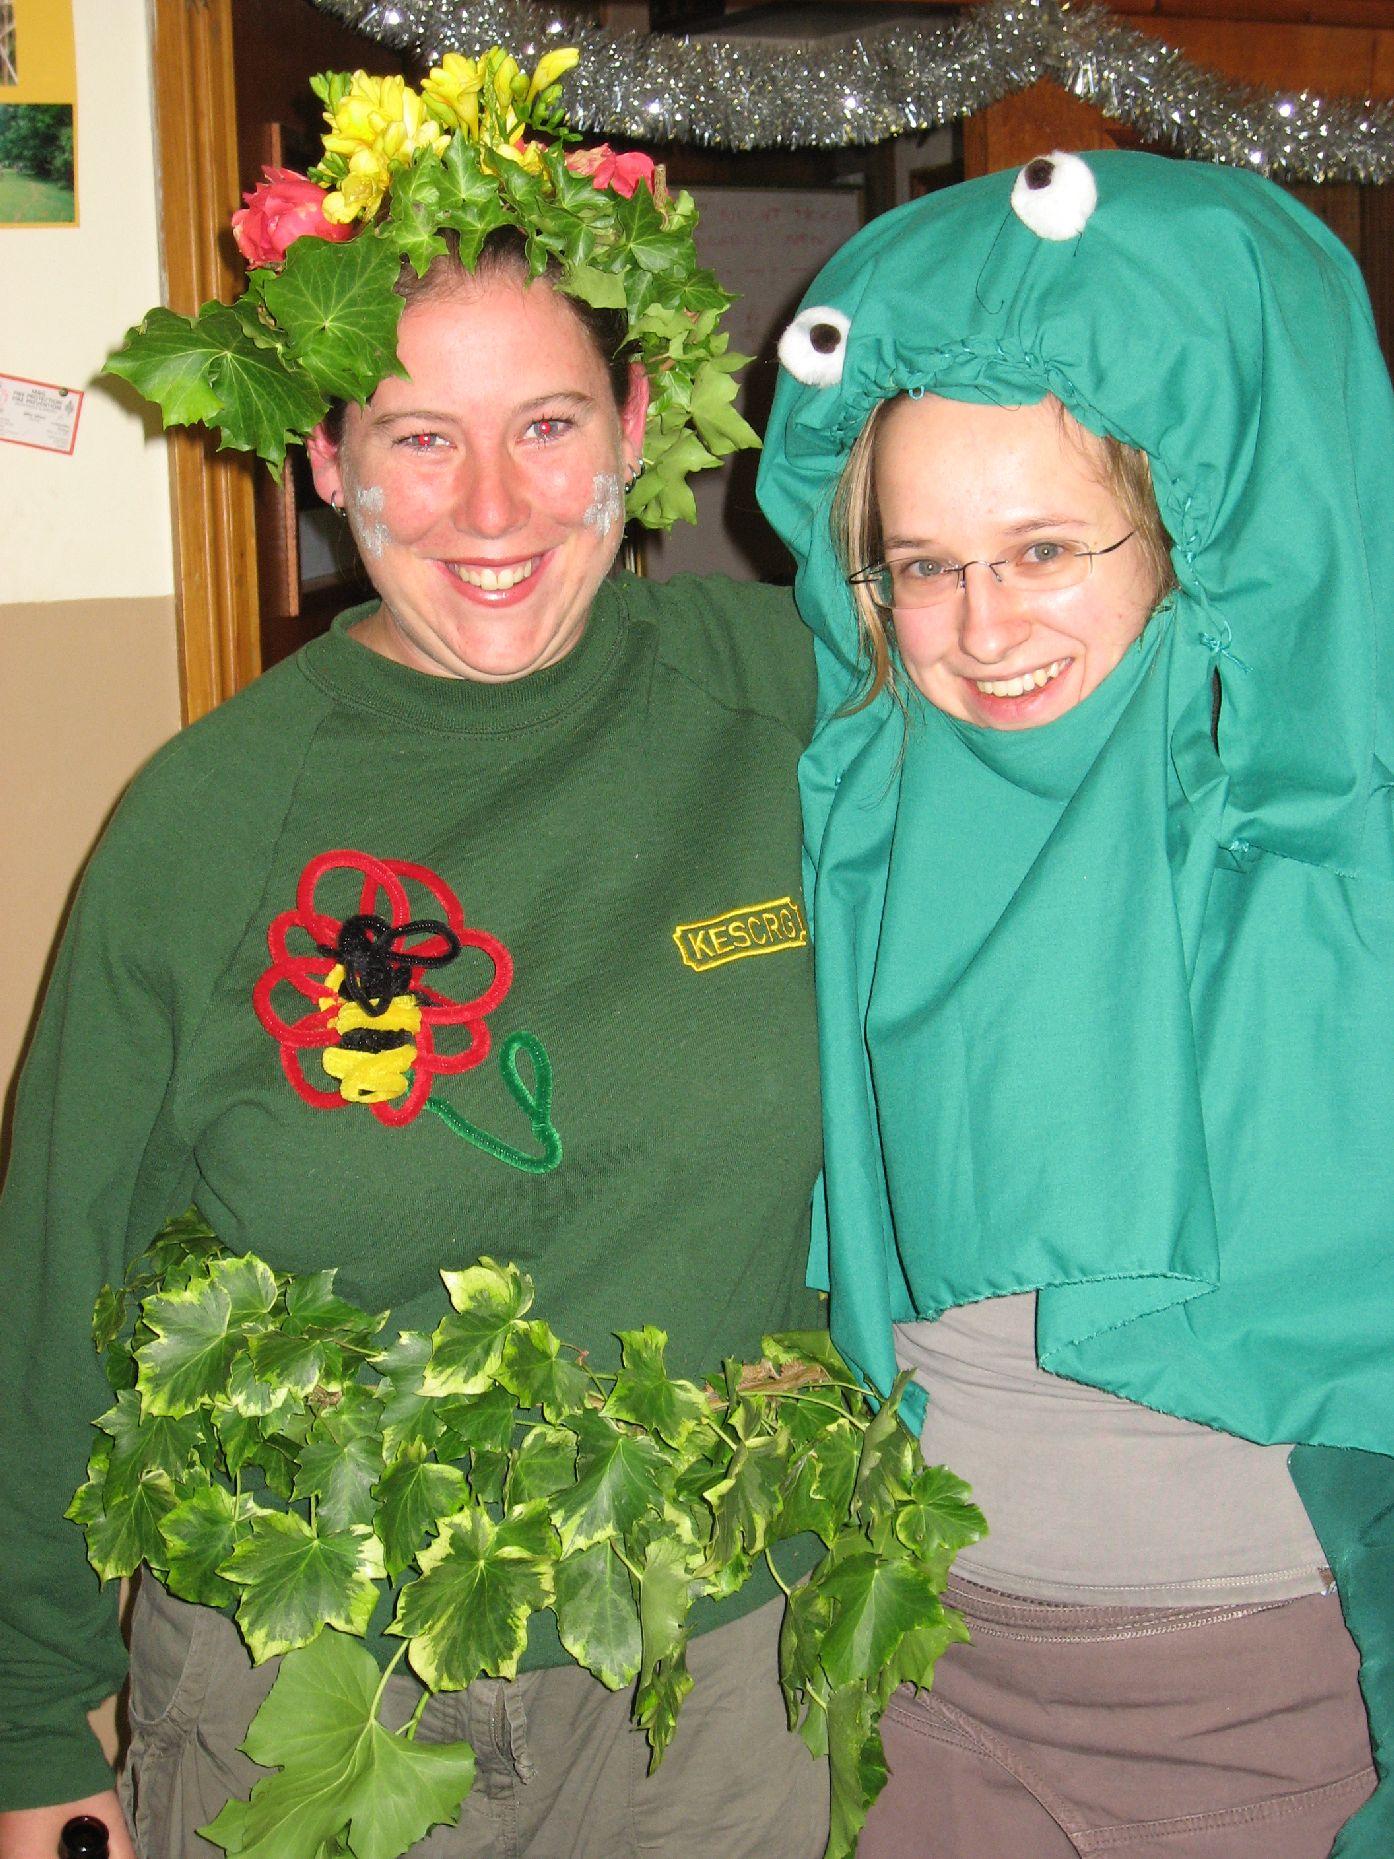 Amy & Claire as the Octopuss garden